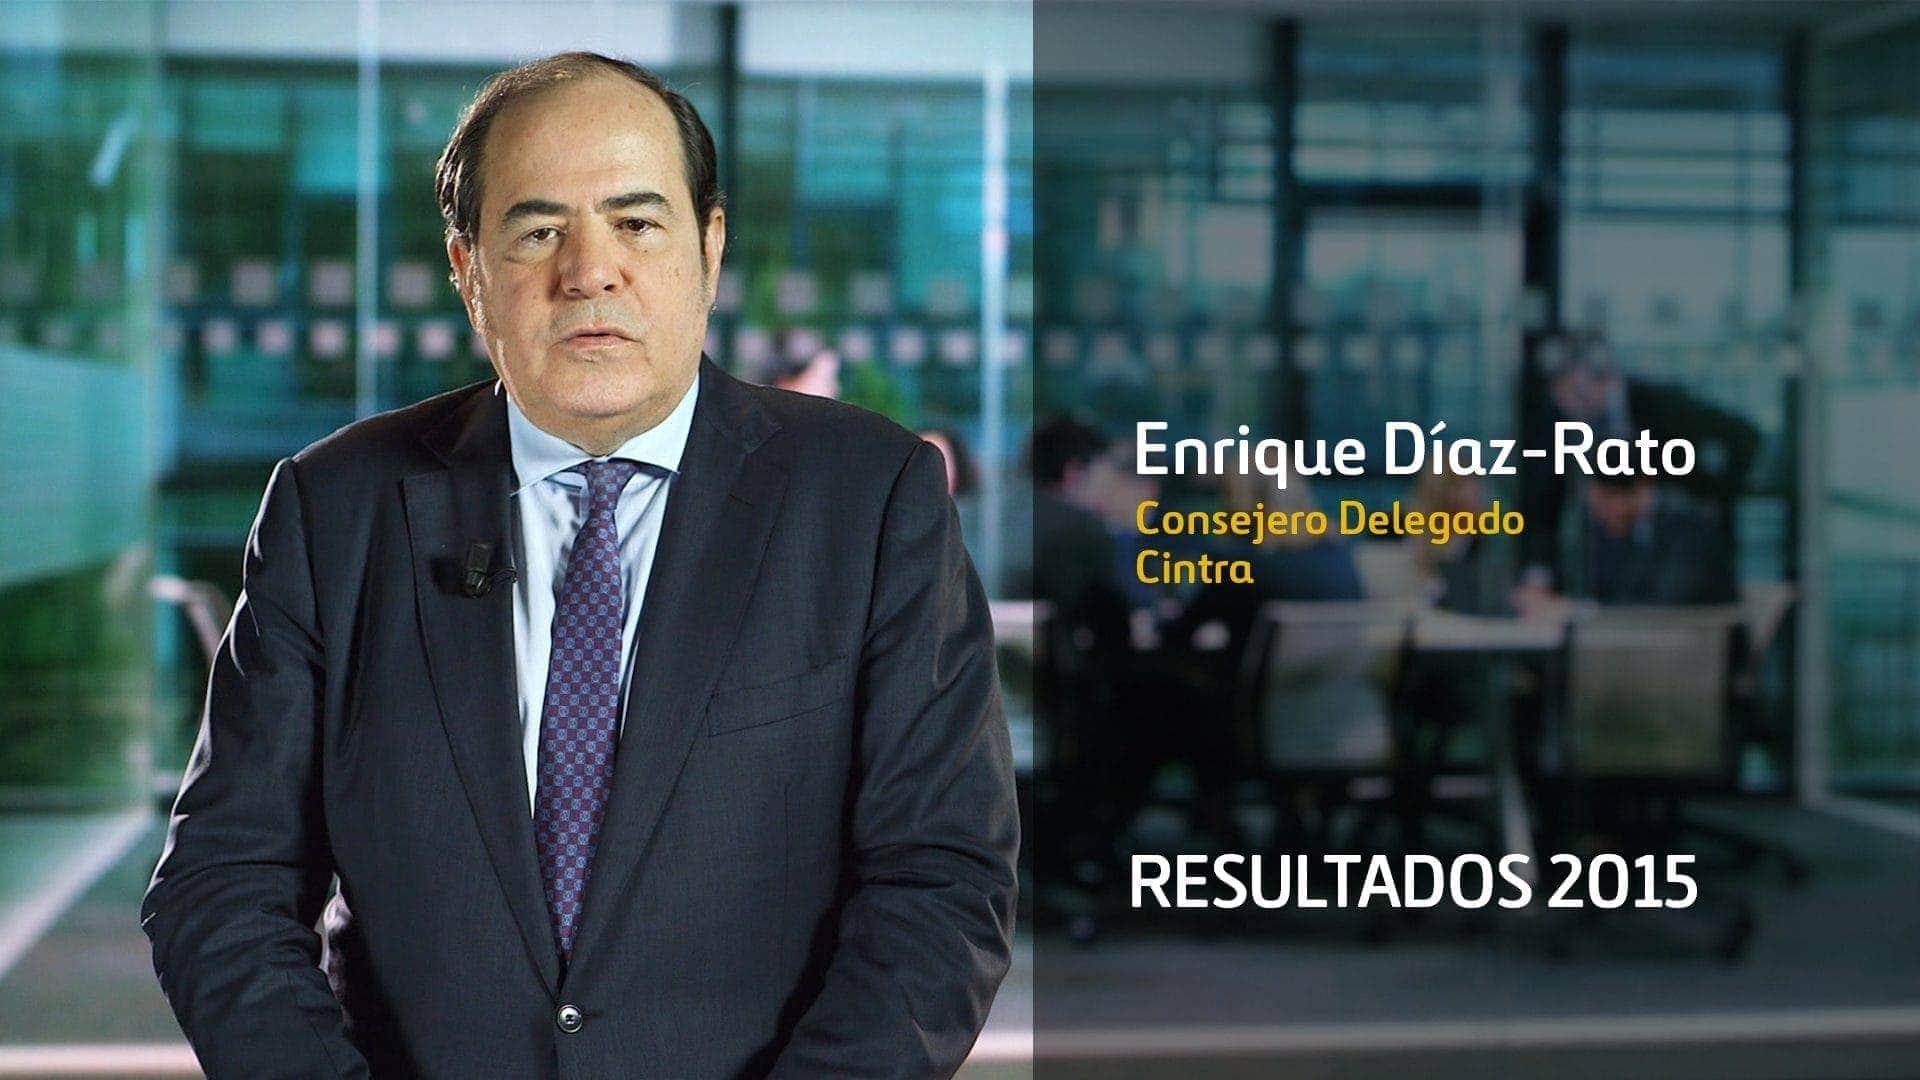 Results 2015 Cintra Ferrovial